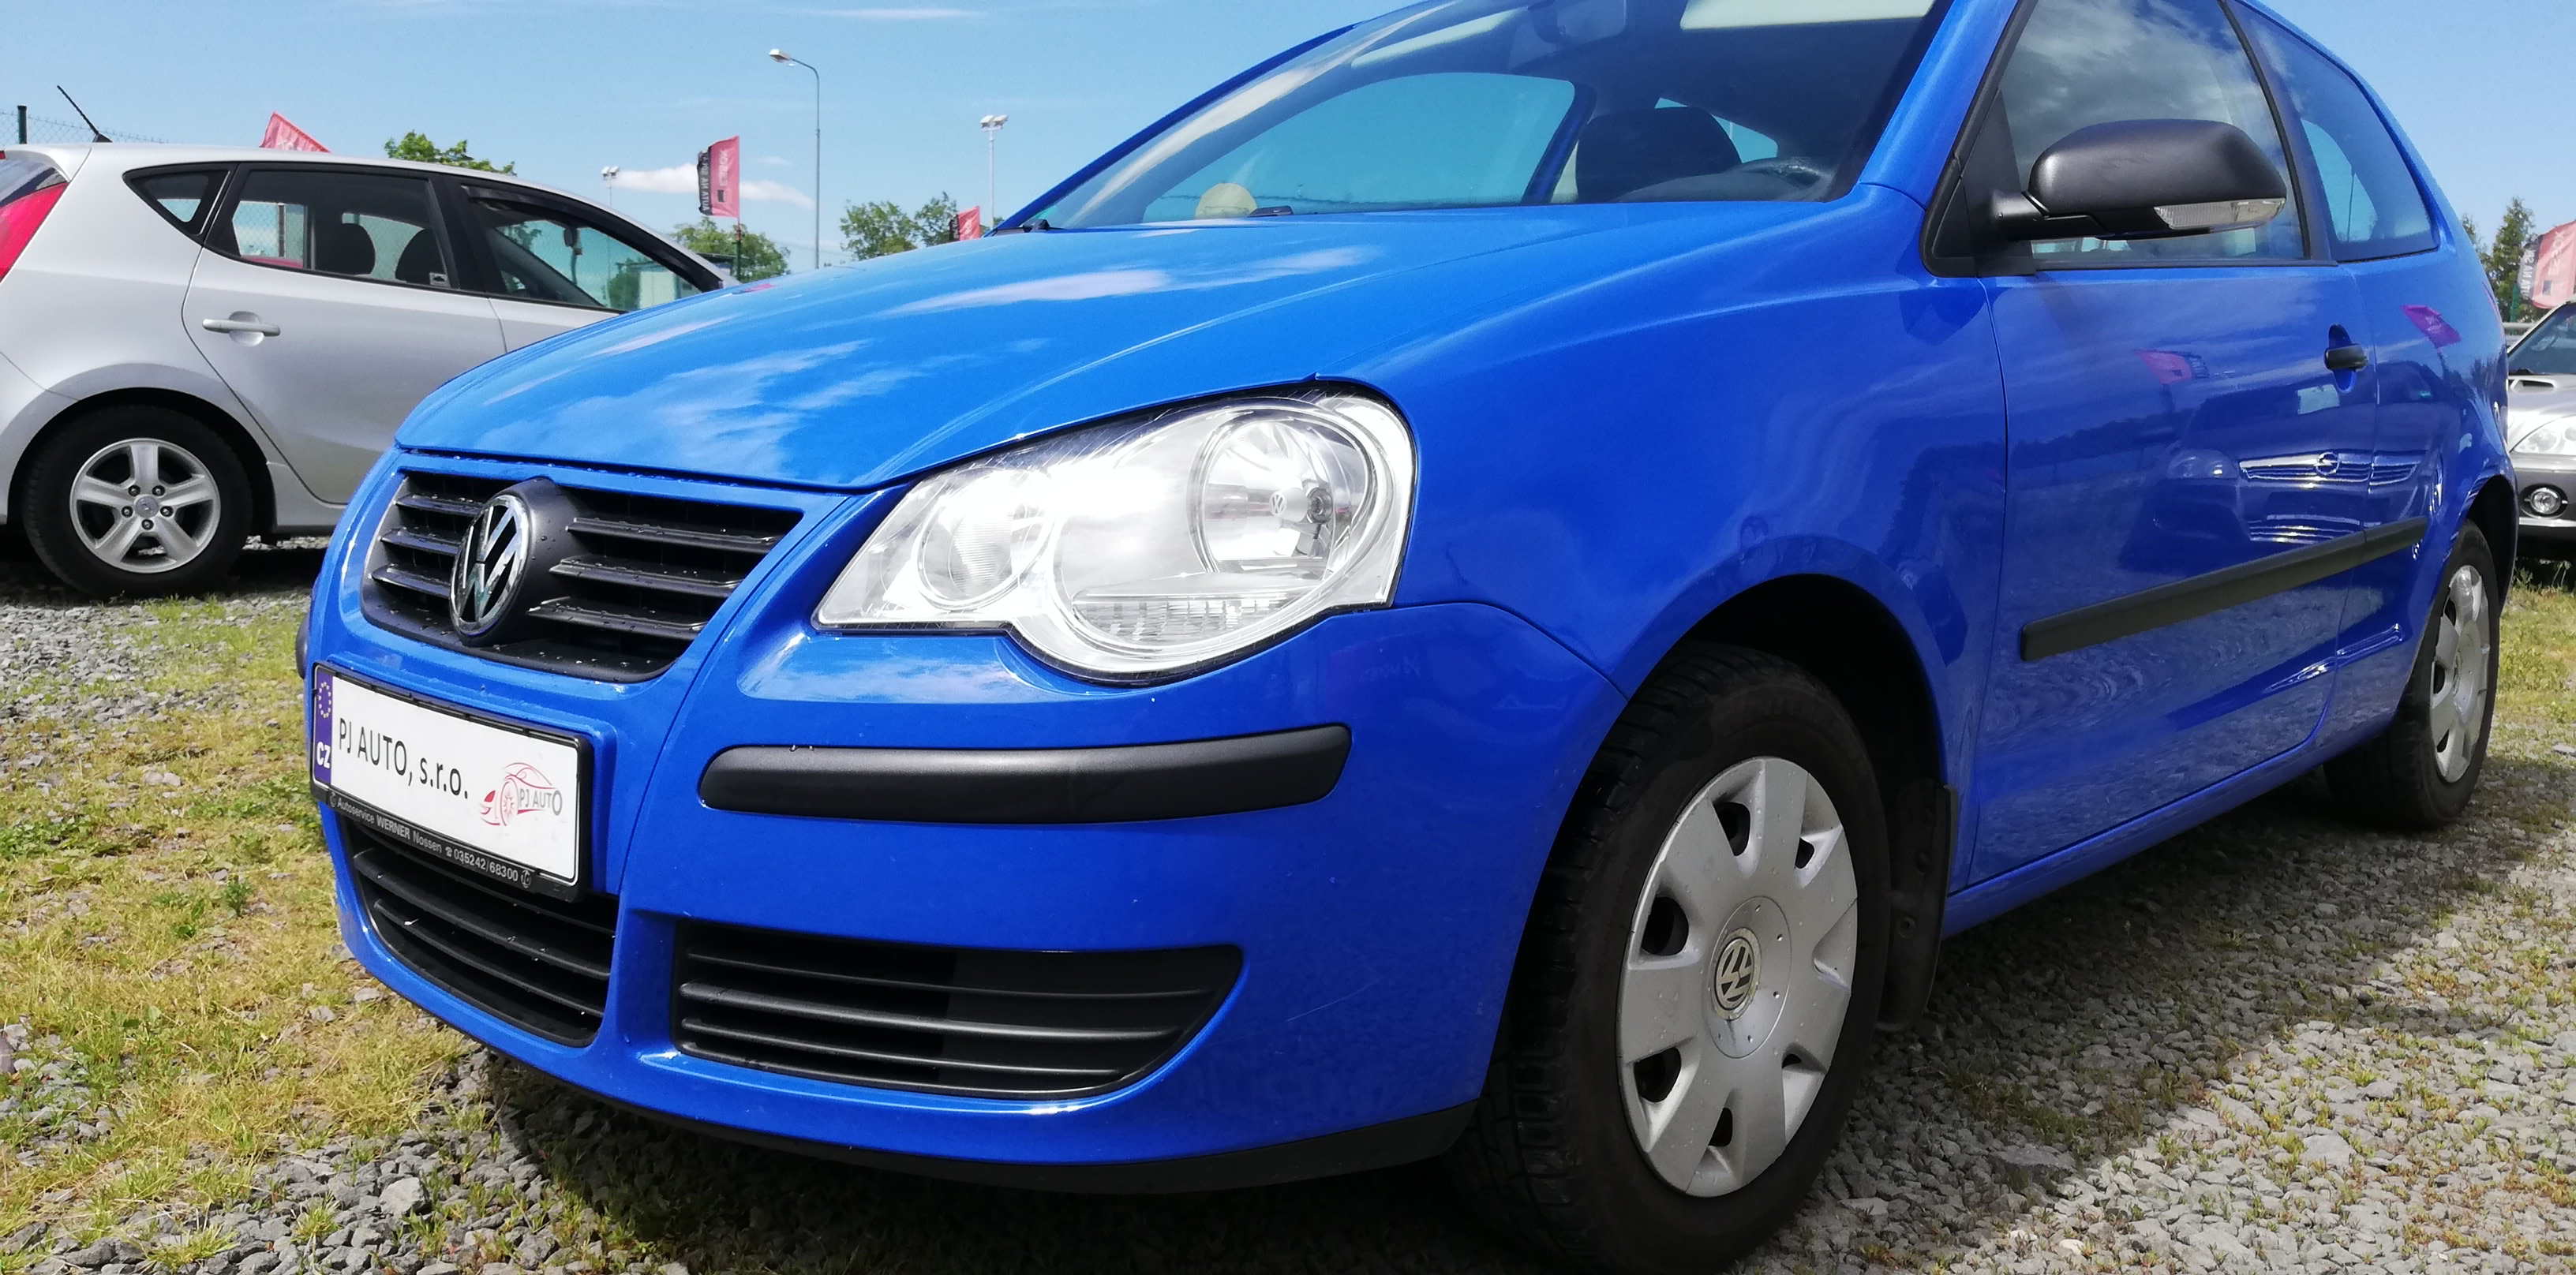 Volkswagen Polo 1.2 44kW Trendline,1maj,99tkm,STK 6/2022